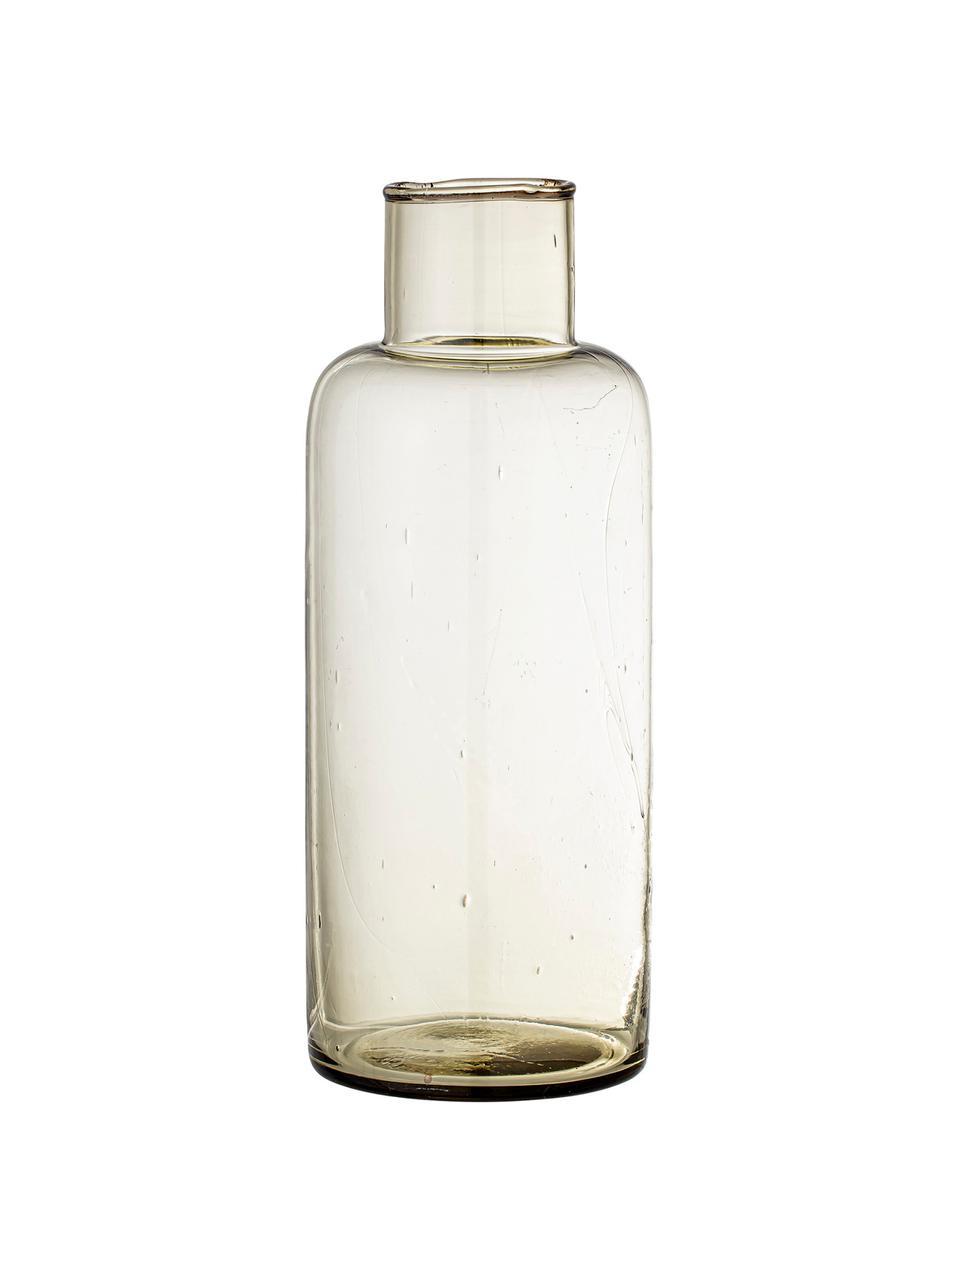 Karaffe Casie aus recyceltem Glas in Braun, 1.5 L, Recyceltes Glas, Braun, transparent, H 26 cm